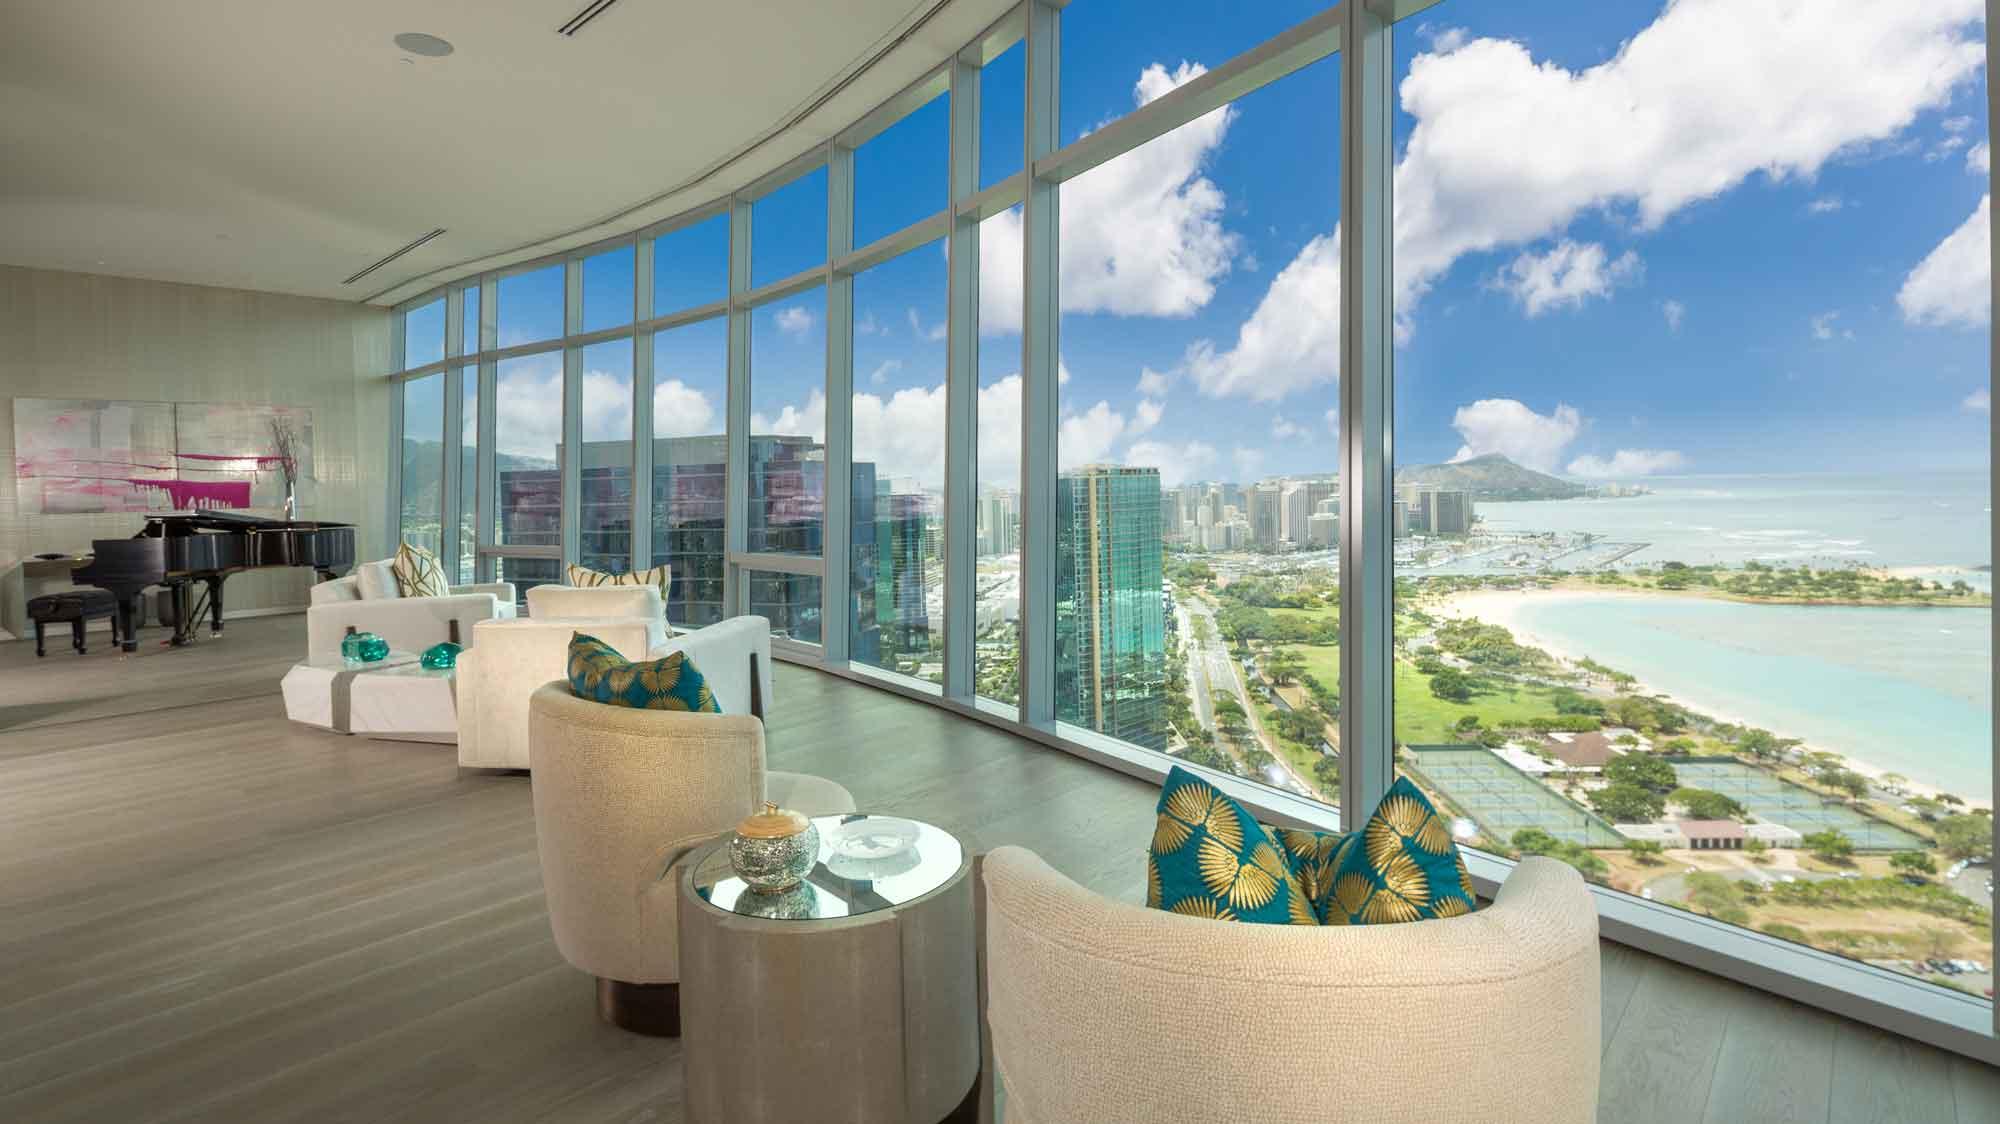 Cinematic vistas of Diamond Head, Waikiki, and Honolulu Harbor area a hallmark of this exclusive Waiea Tower penthouse.